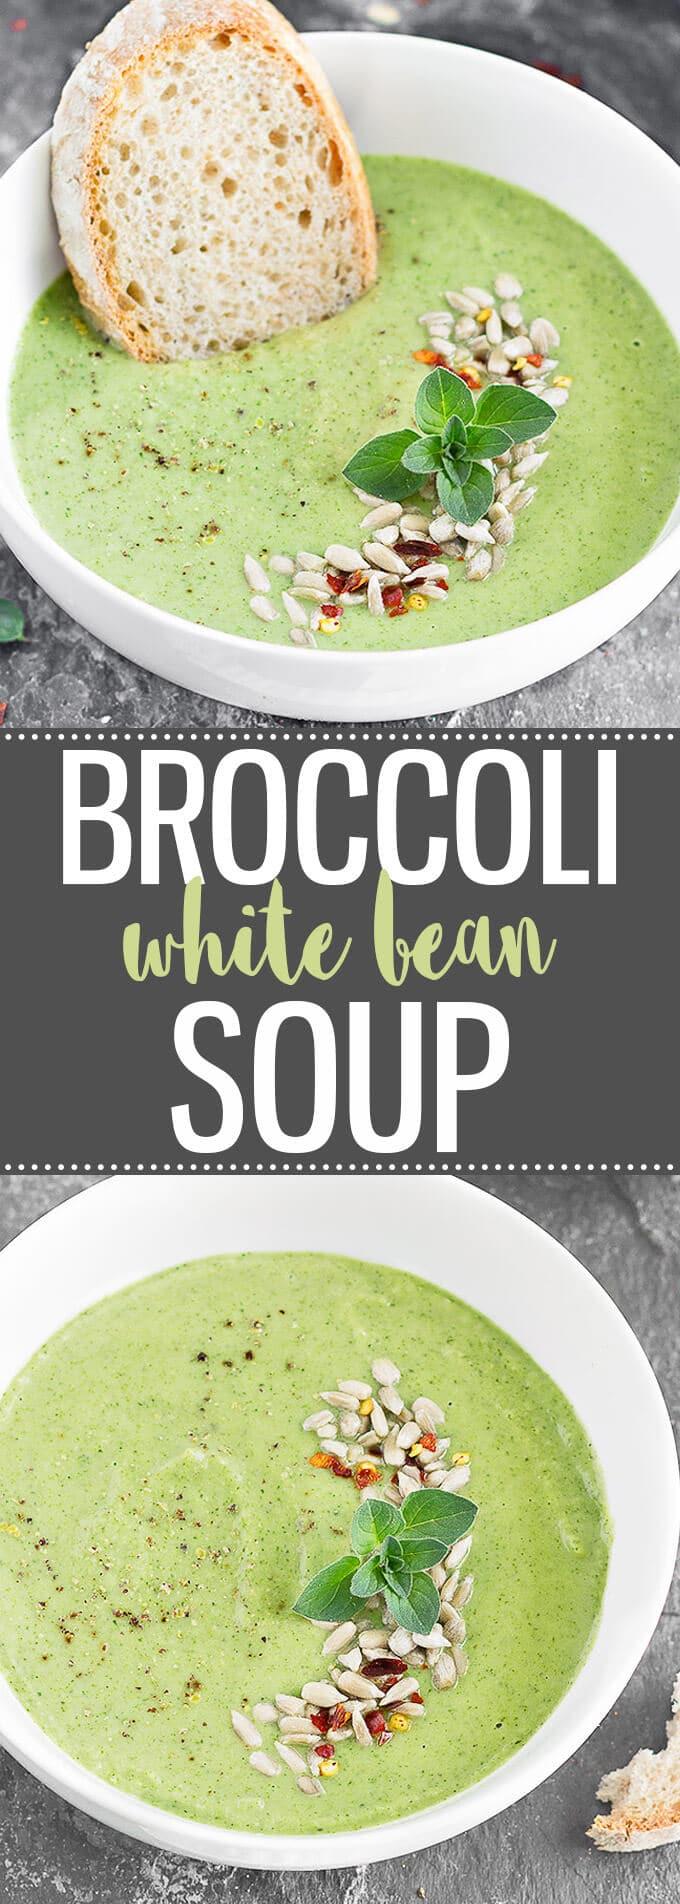 Broccoli White Bean Soup - creamy, healthy and super easy to make! (vegan + gluten-free + dairy-free) #soup #healthyrecipes #healthyeating #vegan #dairyfree #glutenfree #broccolisoup #easyrecipe | aseasyasapplepie.com